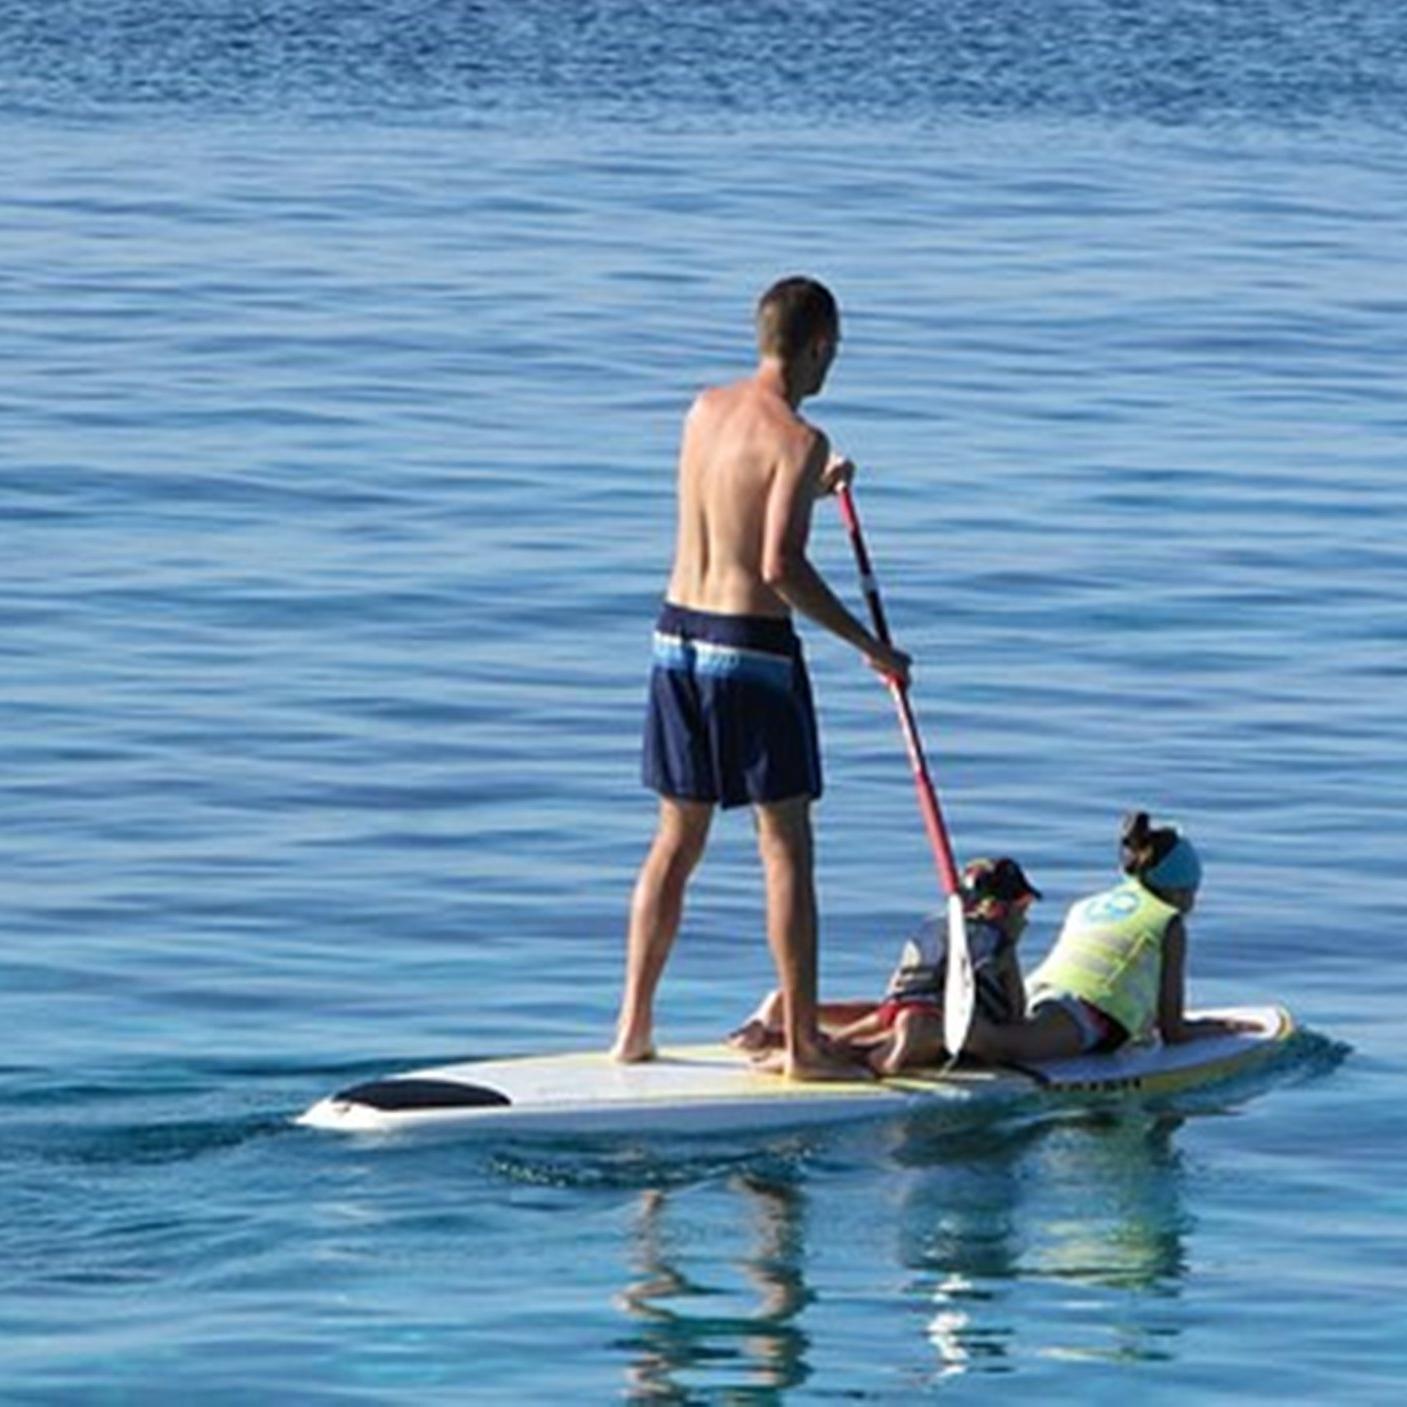 paddle-.jpg